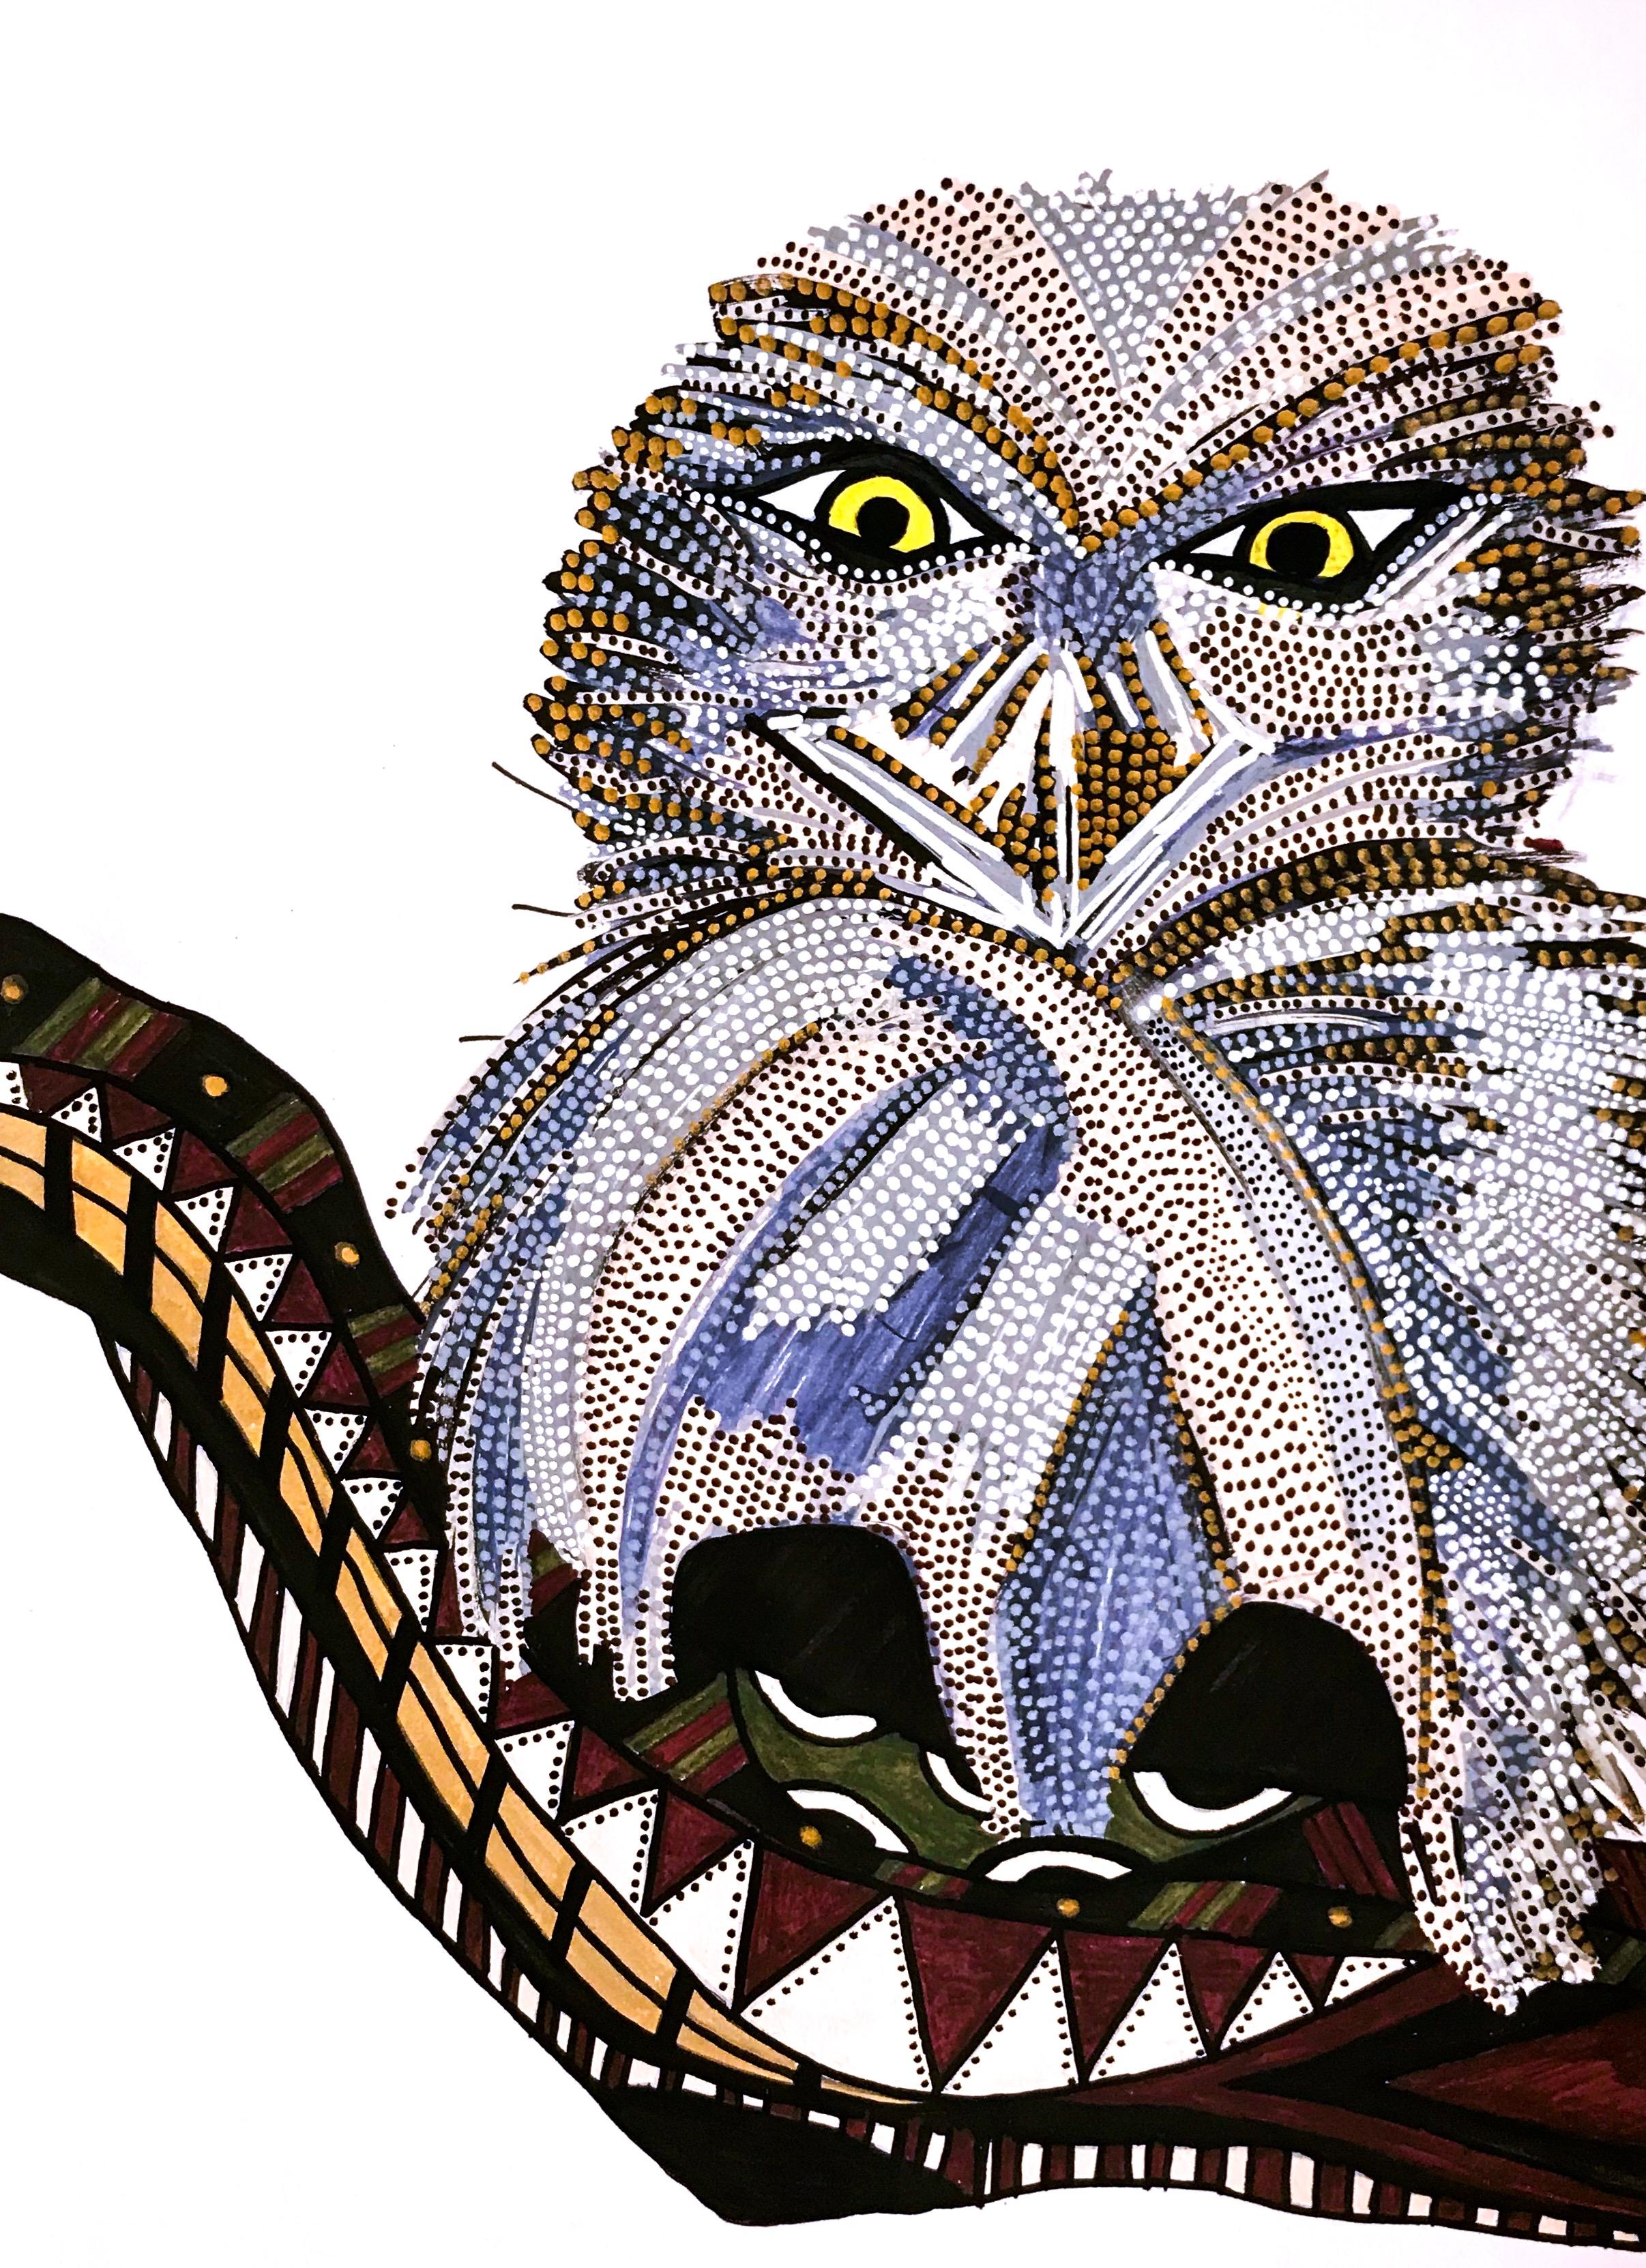 OWL - work on paper; acrylic paint pens21cm x 29.7cmDecember 2018